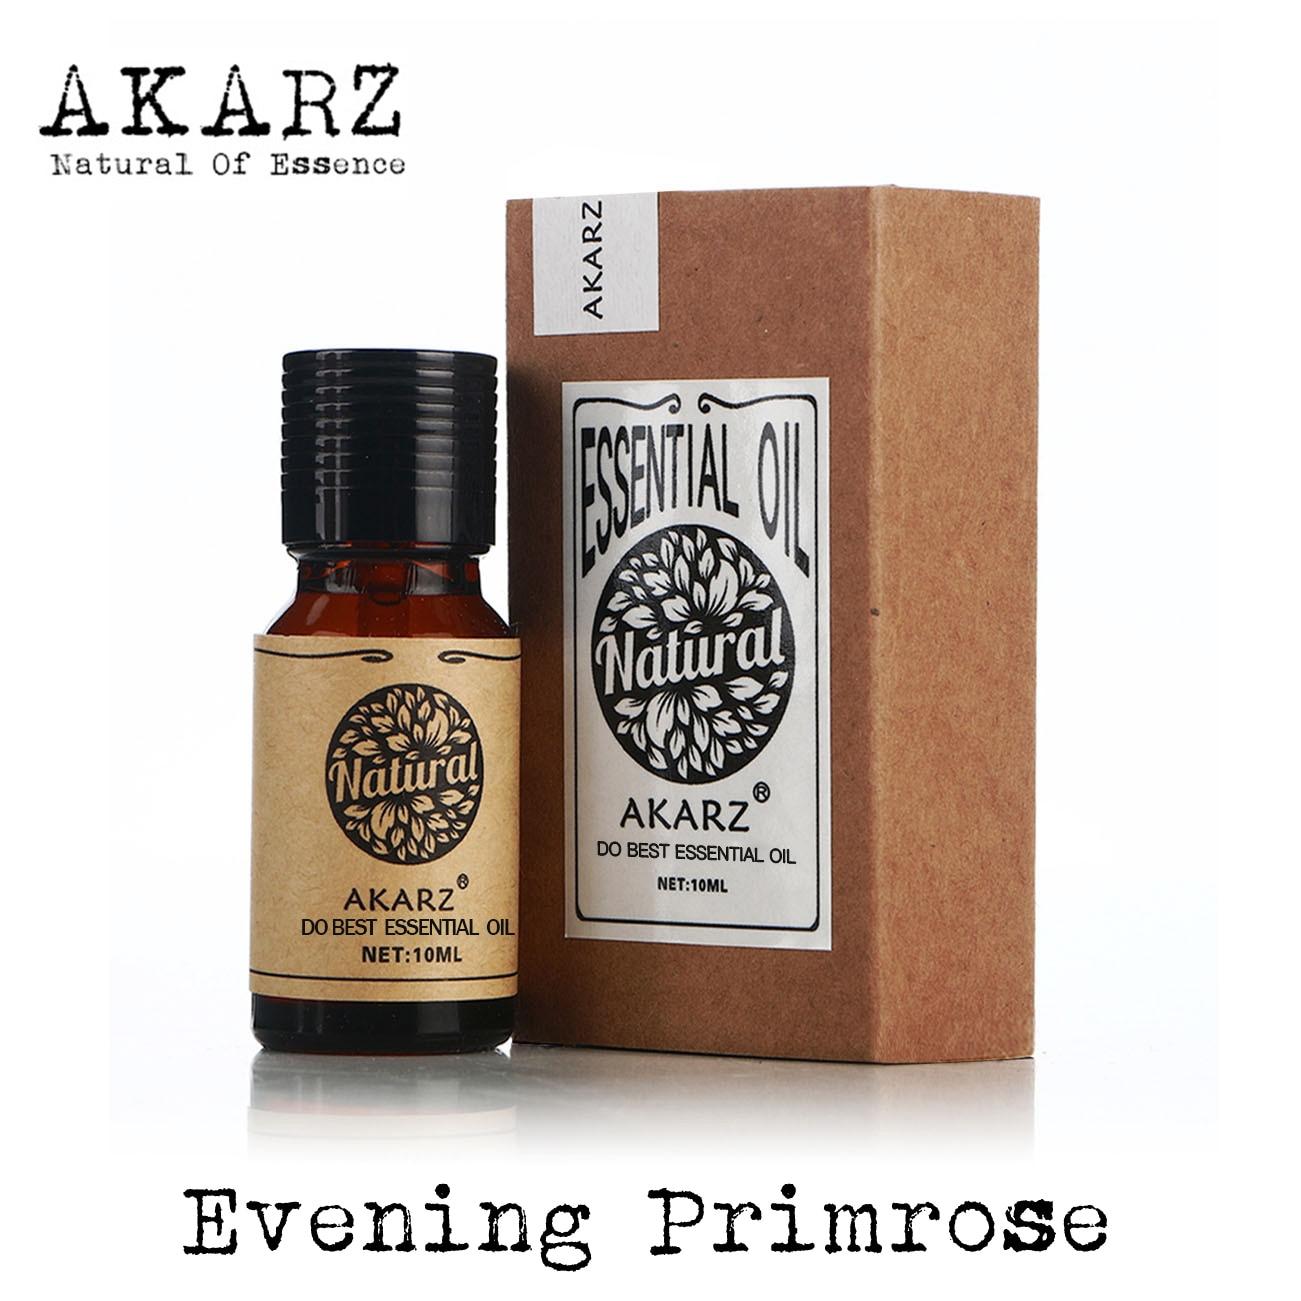 AKARZ Famous Brand Natural Aromatherapy Evening Primrose Essential Oil Skin Moisture Cure Eczema Evening Primrose Oil